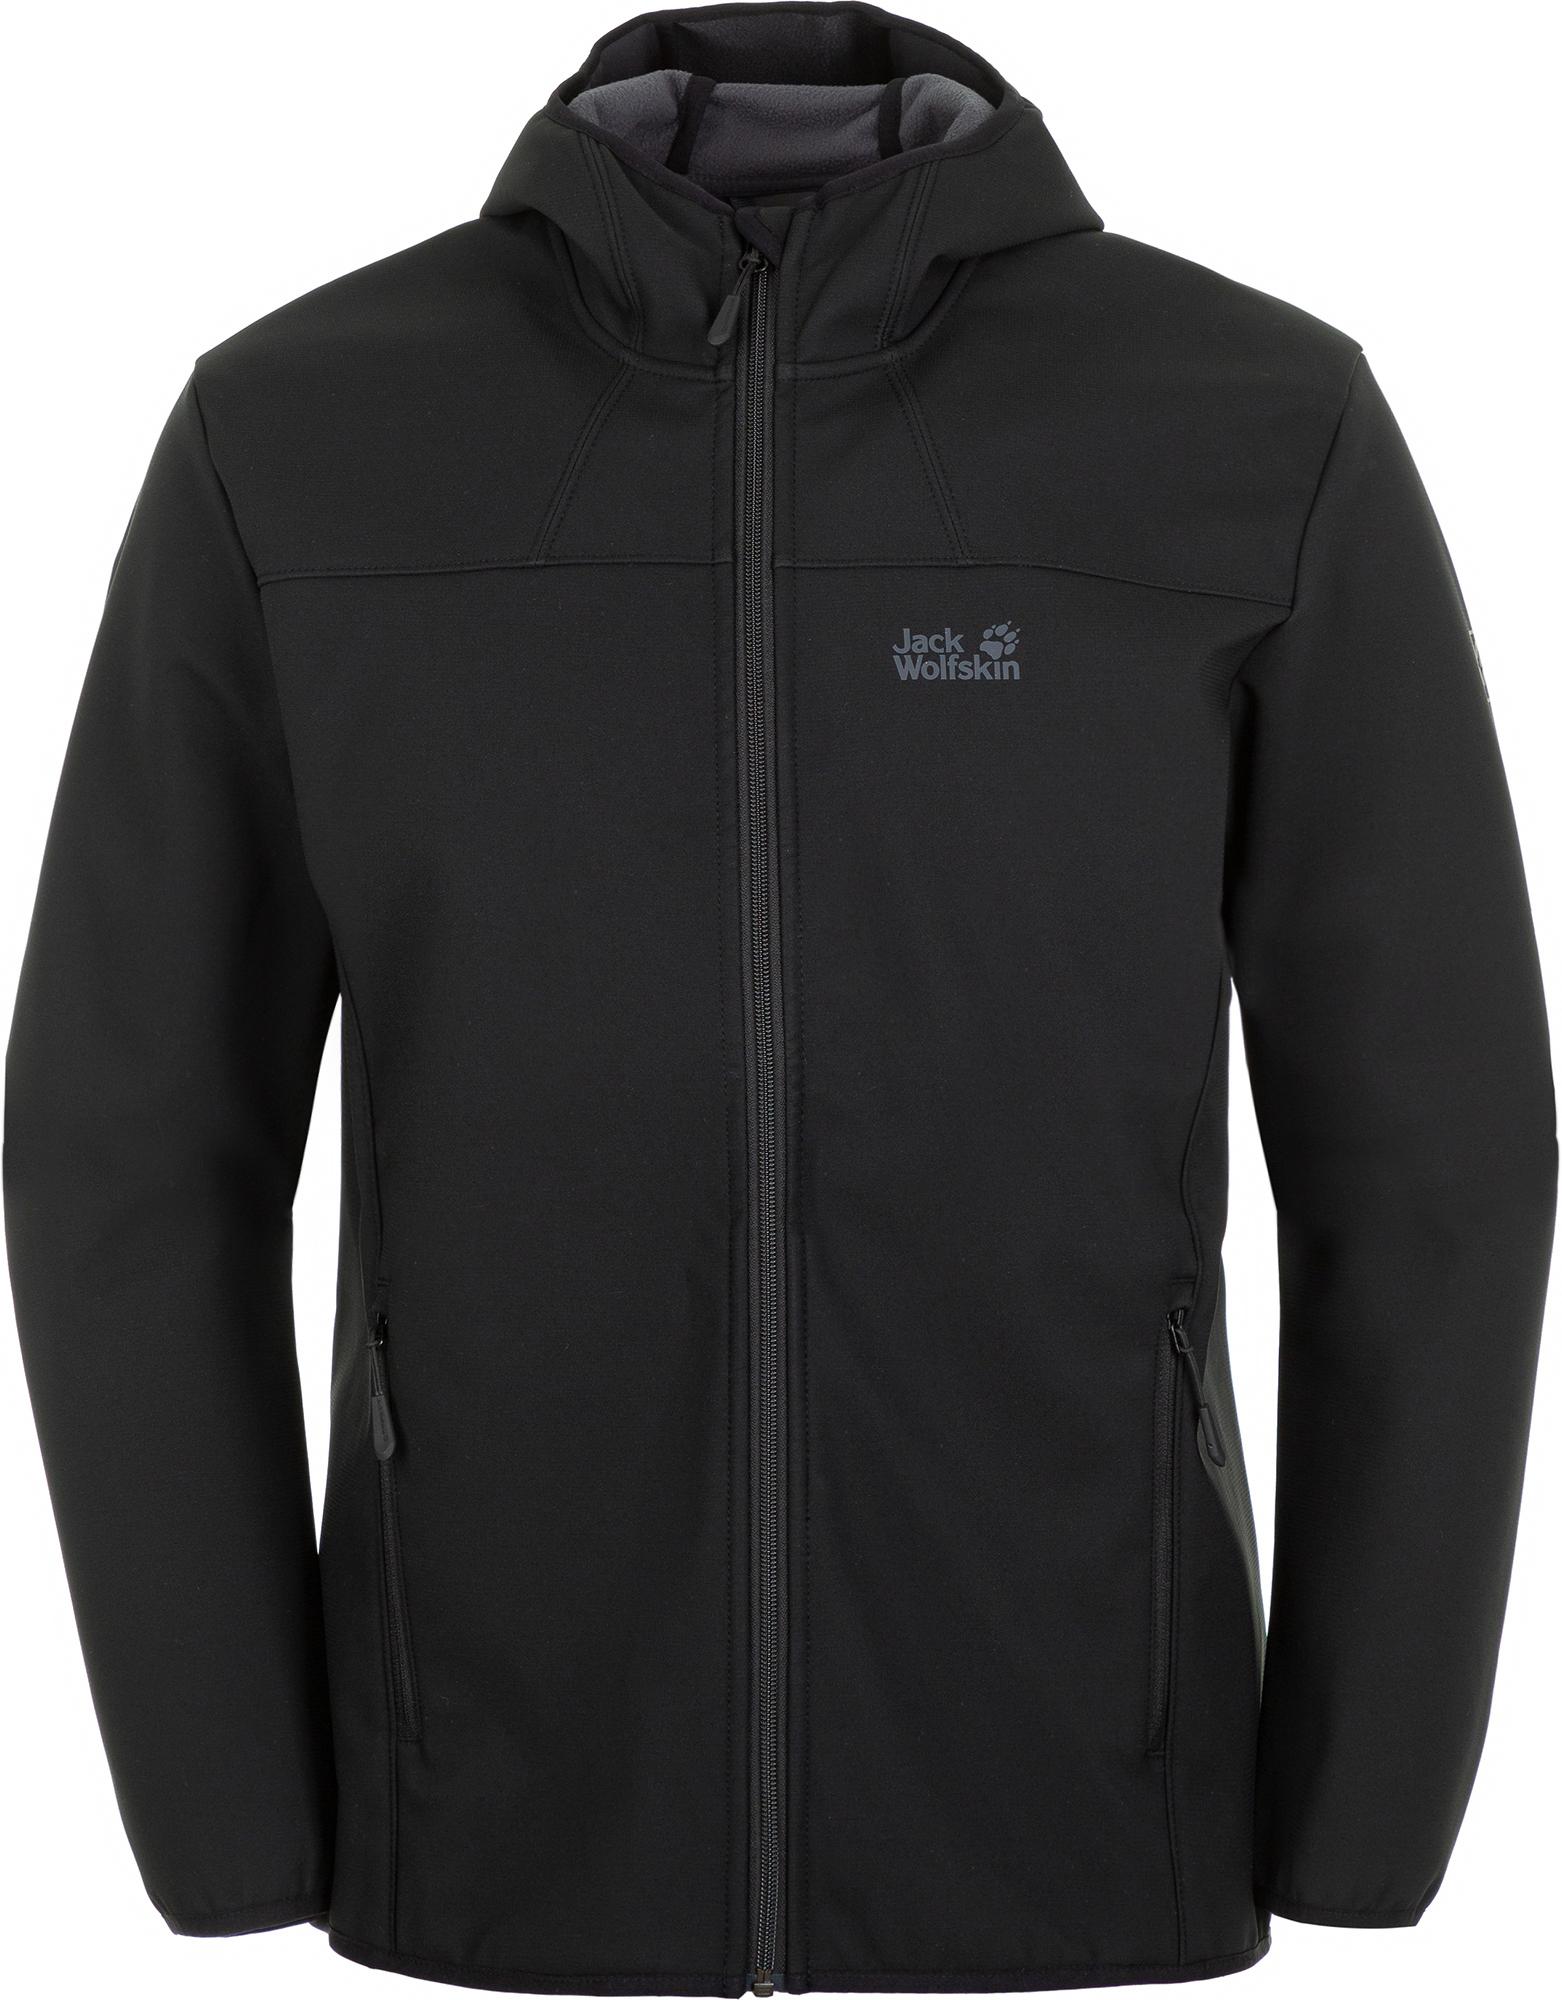 JACK WOLFSKIN Куртка софтшелл мужская JACK WOLFSKIN Northern Point, размер 54-56